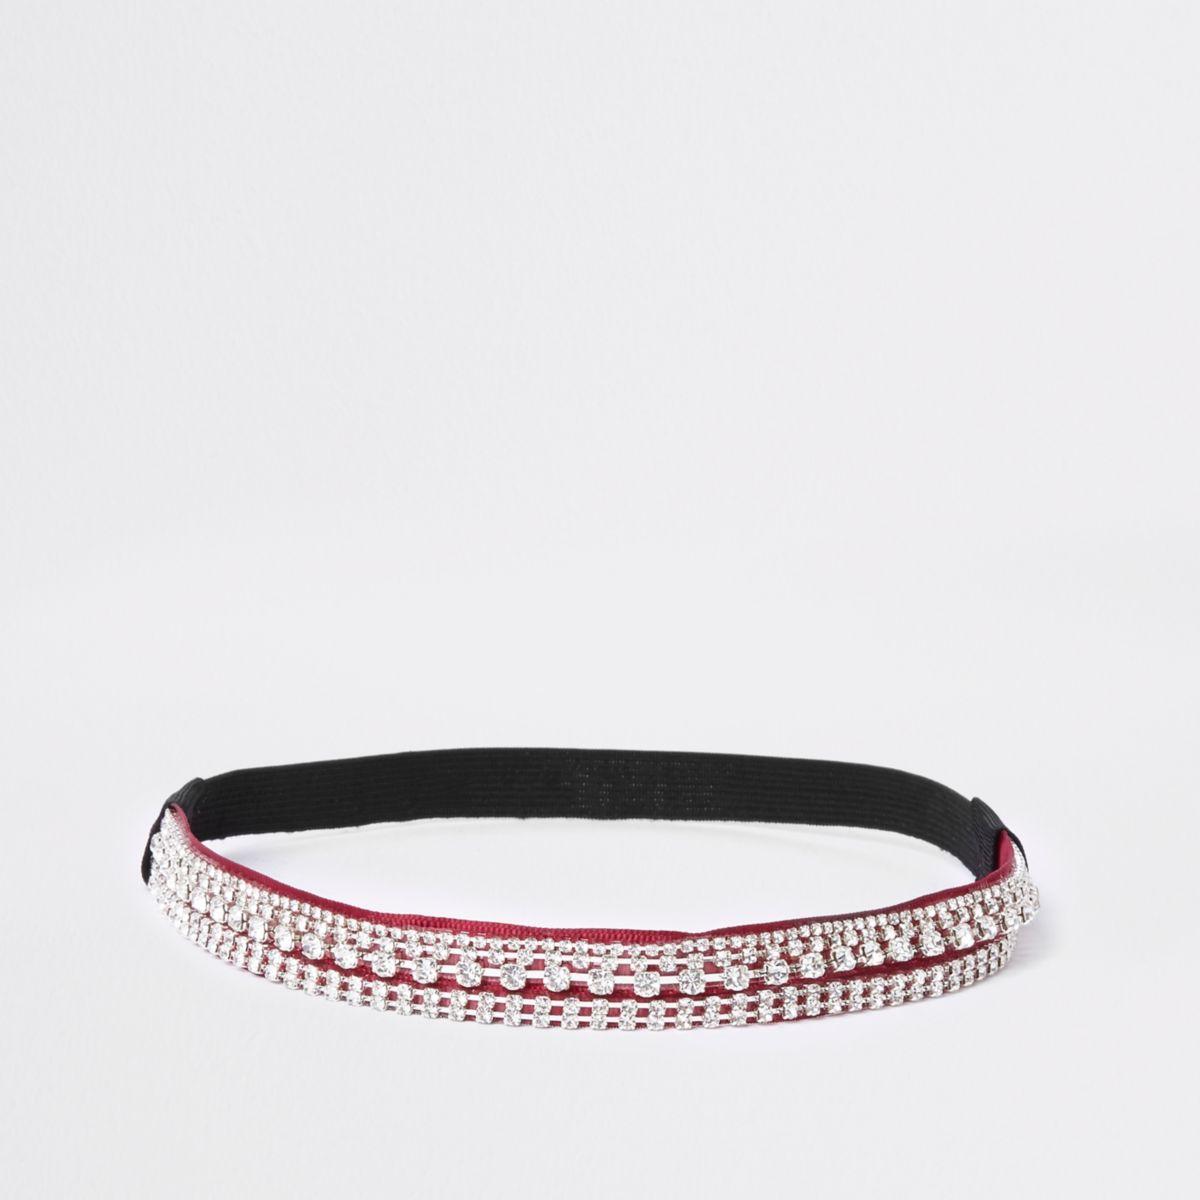 Red rhinestone embellished headband